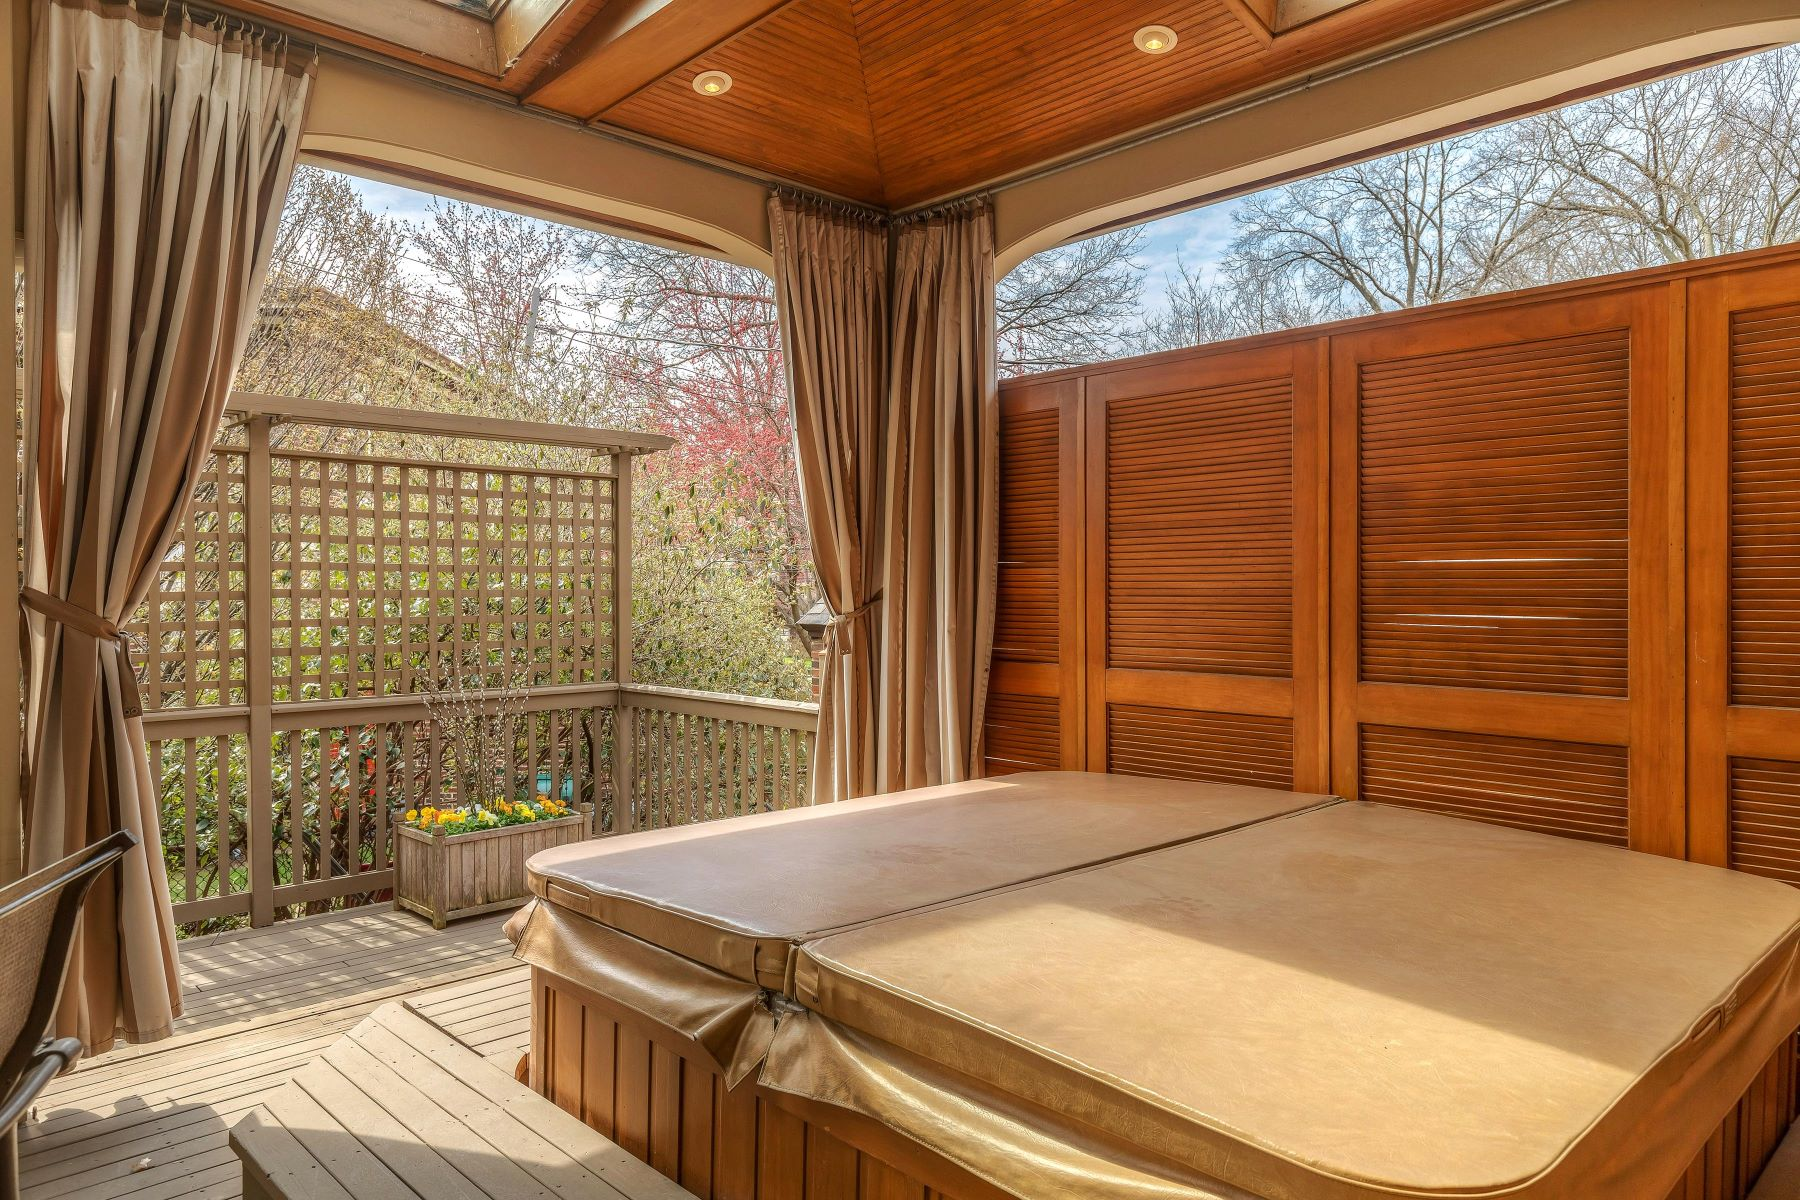 Additional photo for property listing at Condo Alternative in University Hills 508 Purdue Avenue University City, Missouri 63130 United States